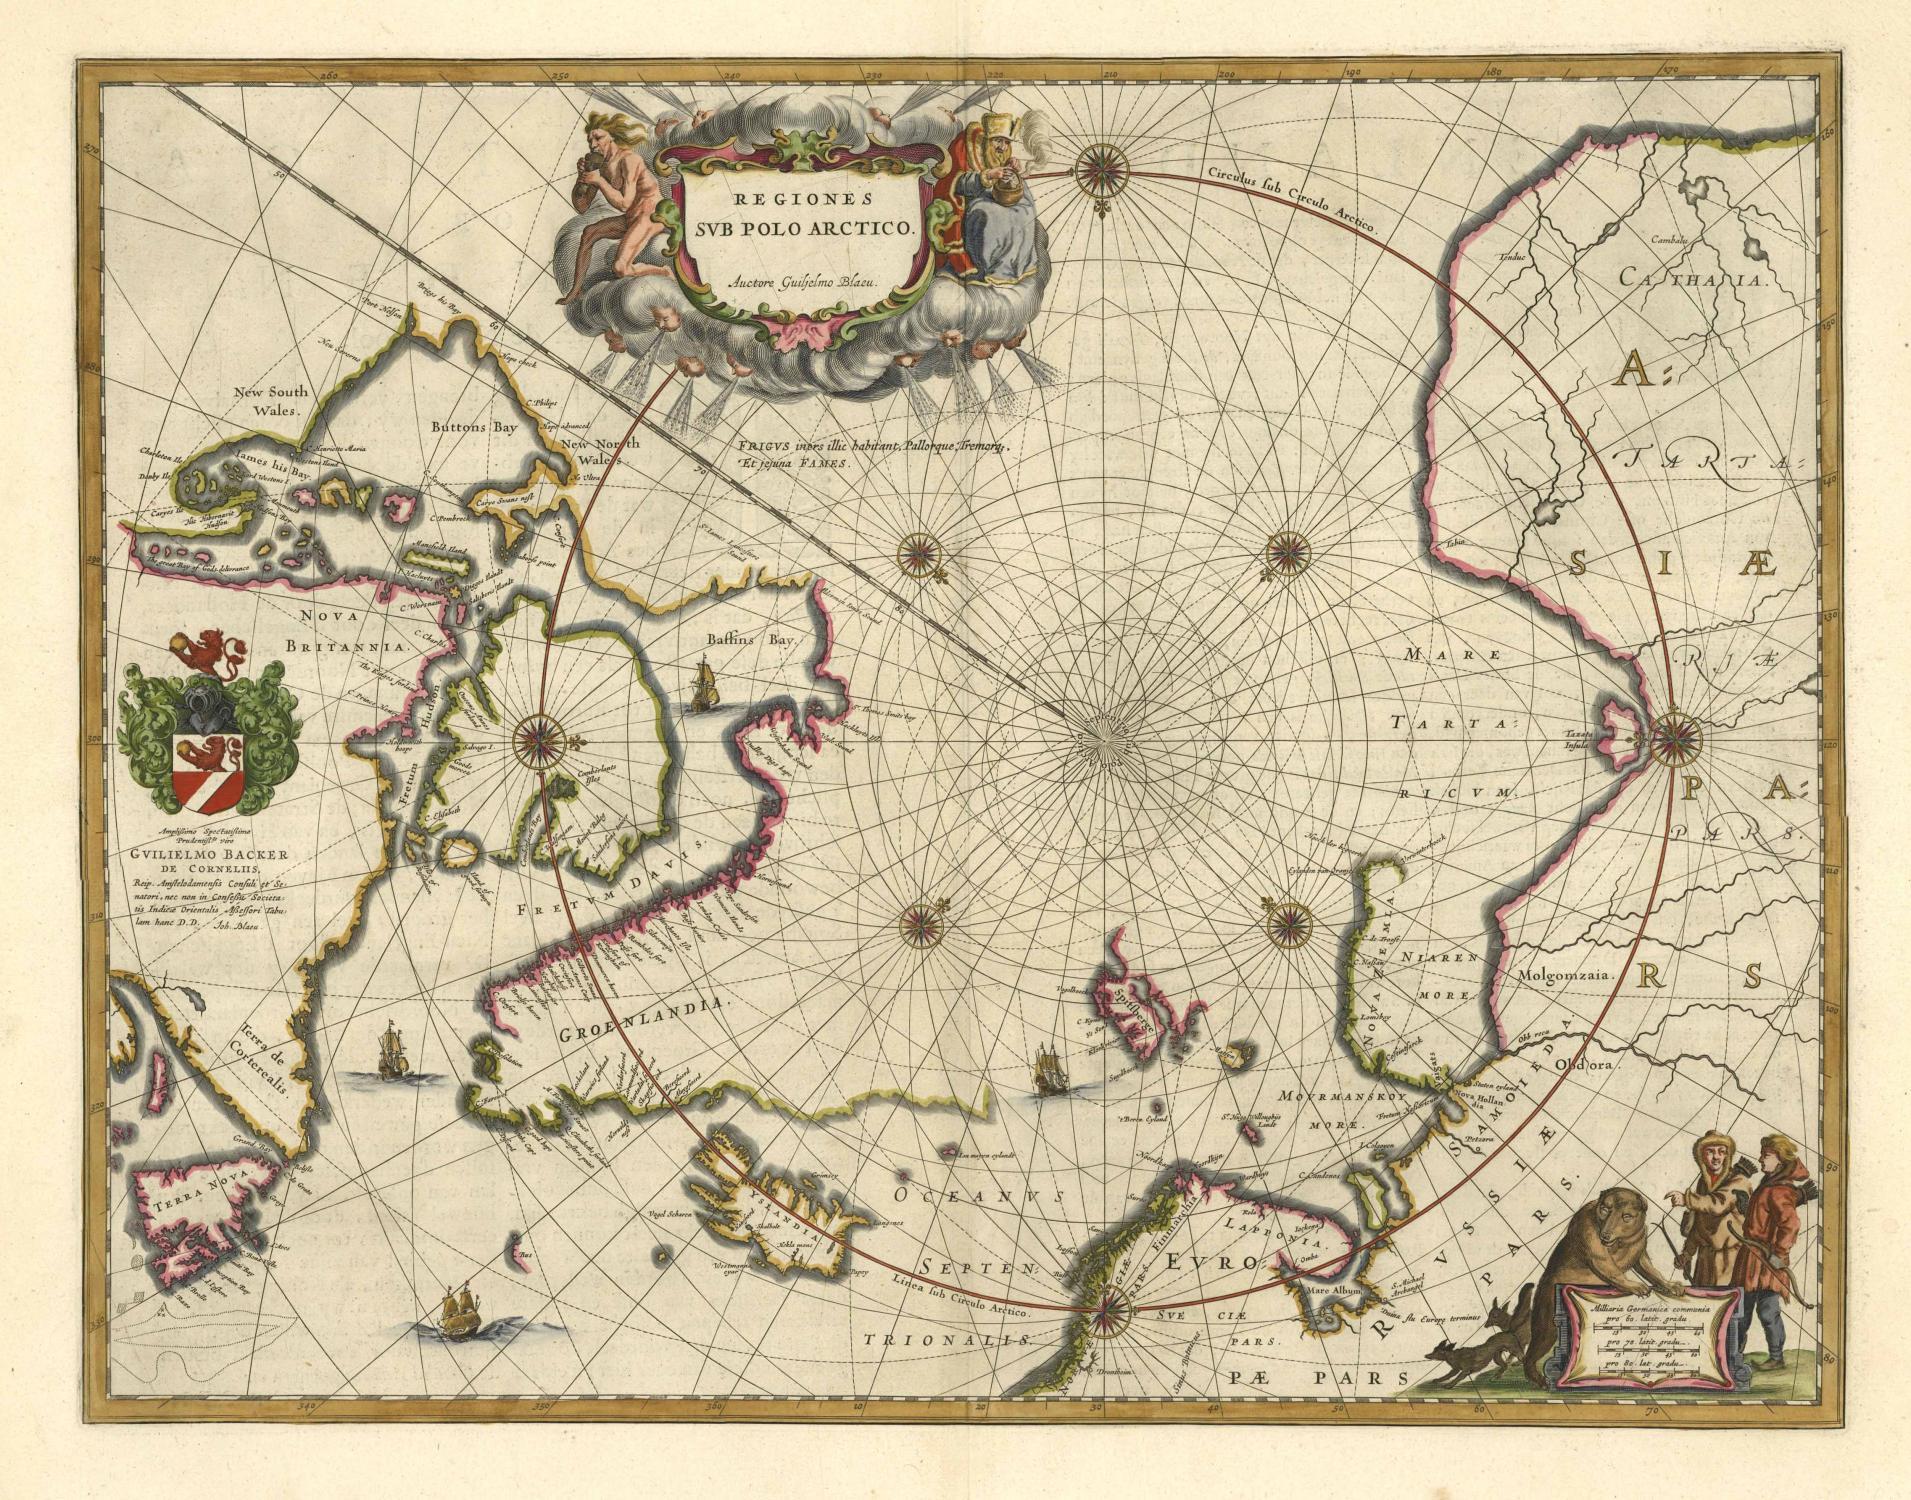 Nordpolarmeer Karte.Regiones Svb Polo Arctico Auctore Guiljelmo